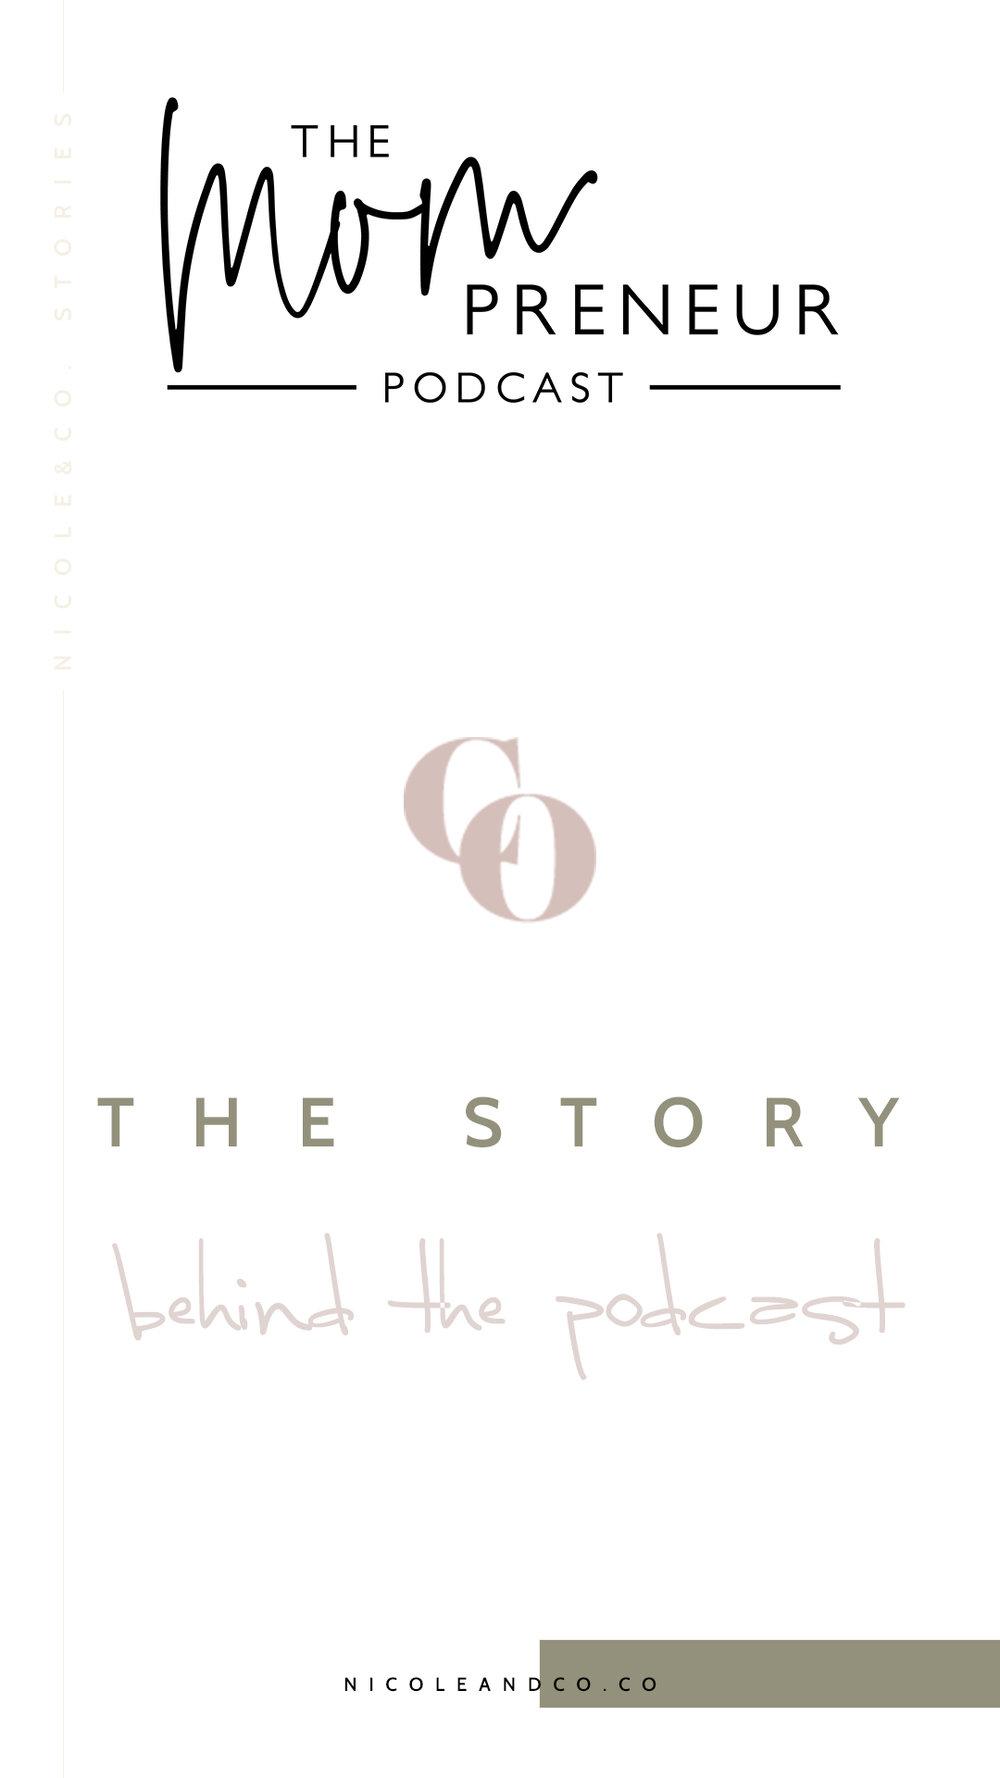 PodcastStory.jpg